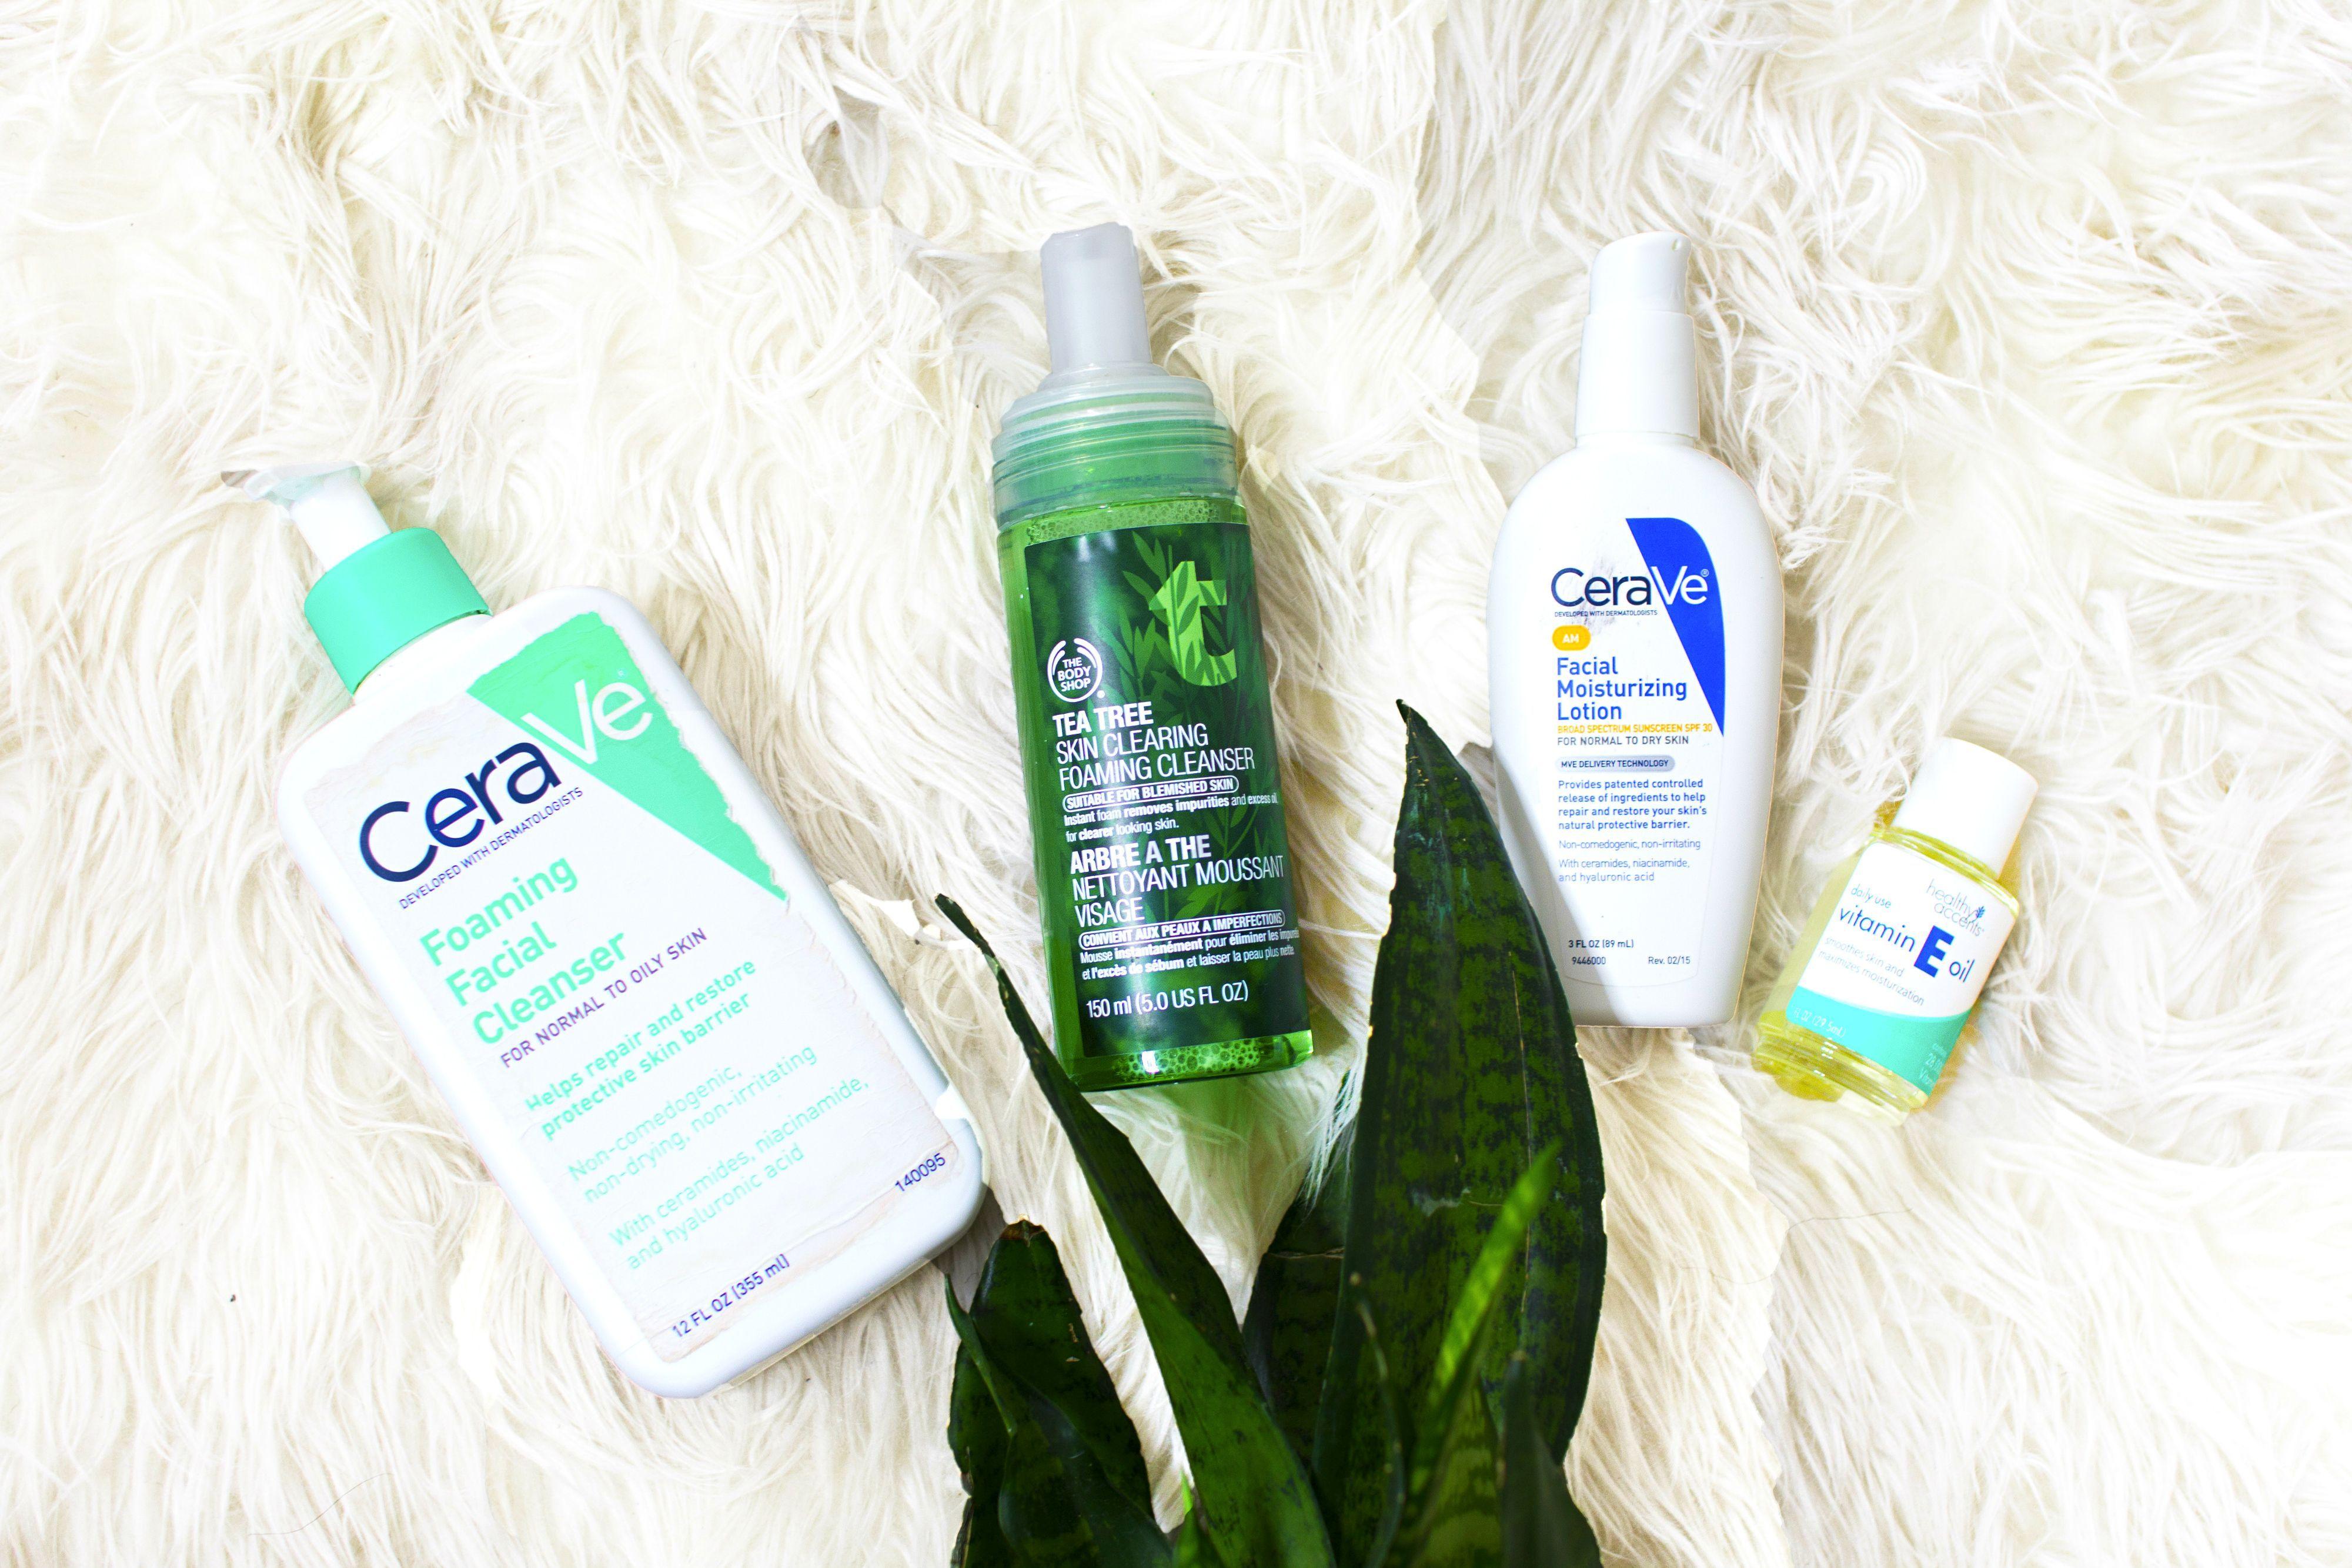 How I Improved My Acne Prone Skin Sensitive Acne Prone Skin Rosacea Skin Care Healthy Skin Cream